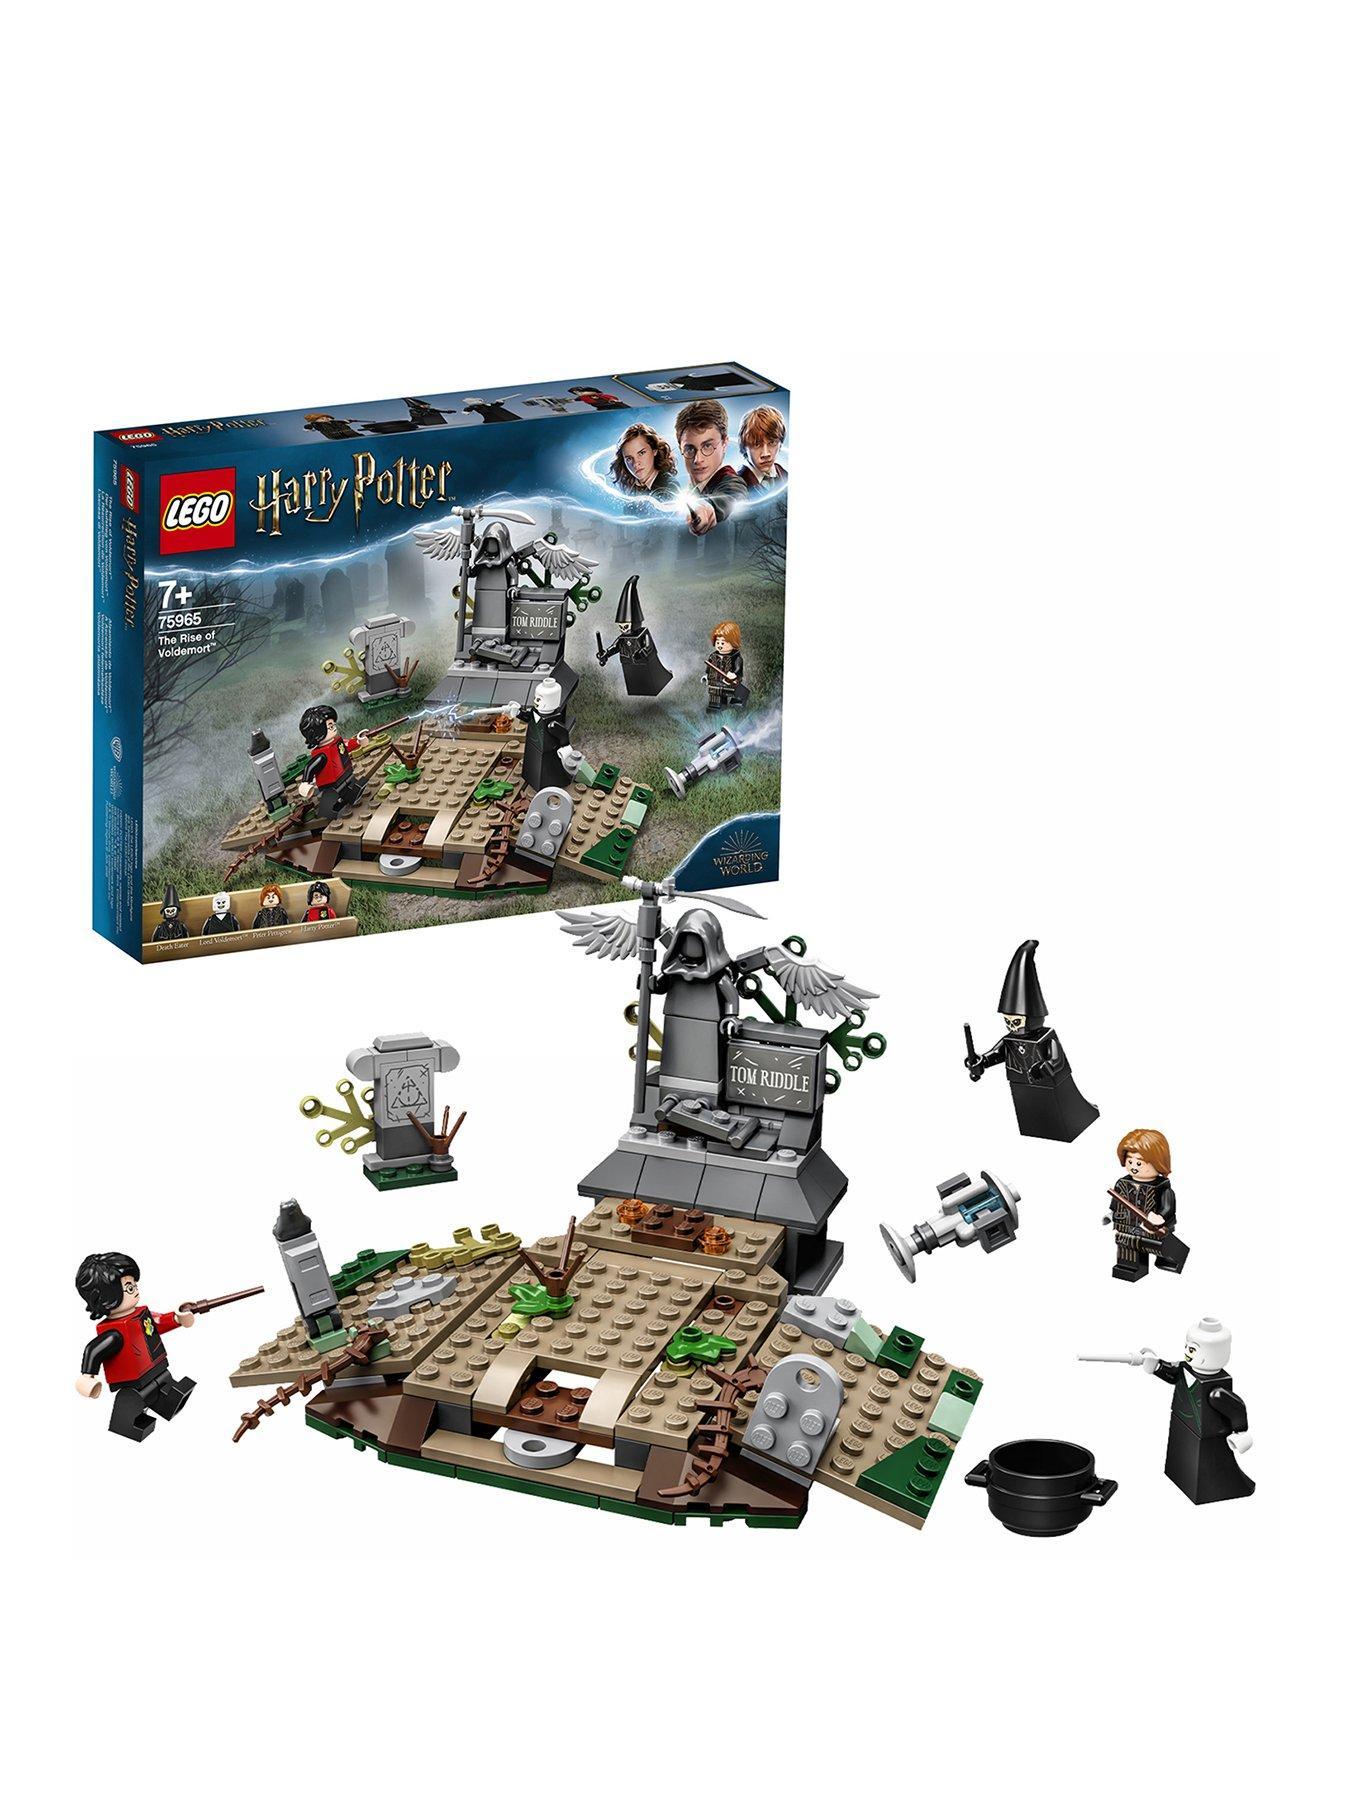 Lego Harry Potter 75946-Harry Potter authentique figurine figure!